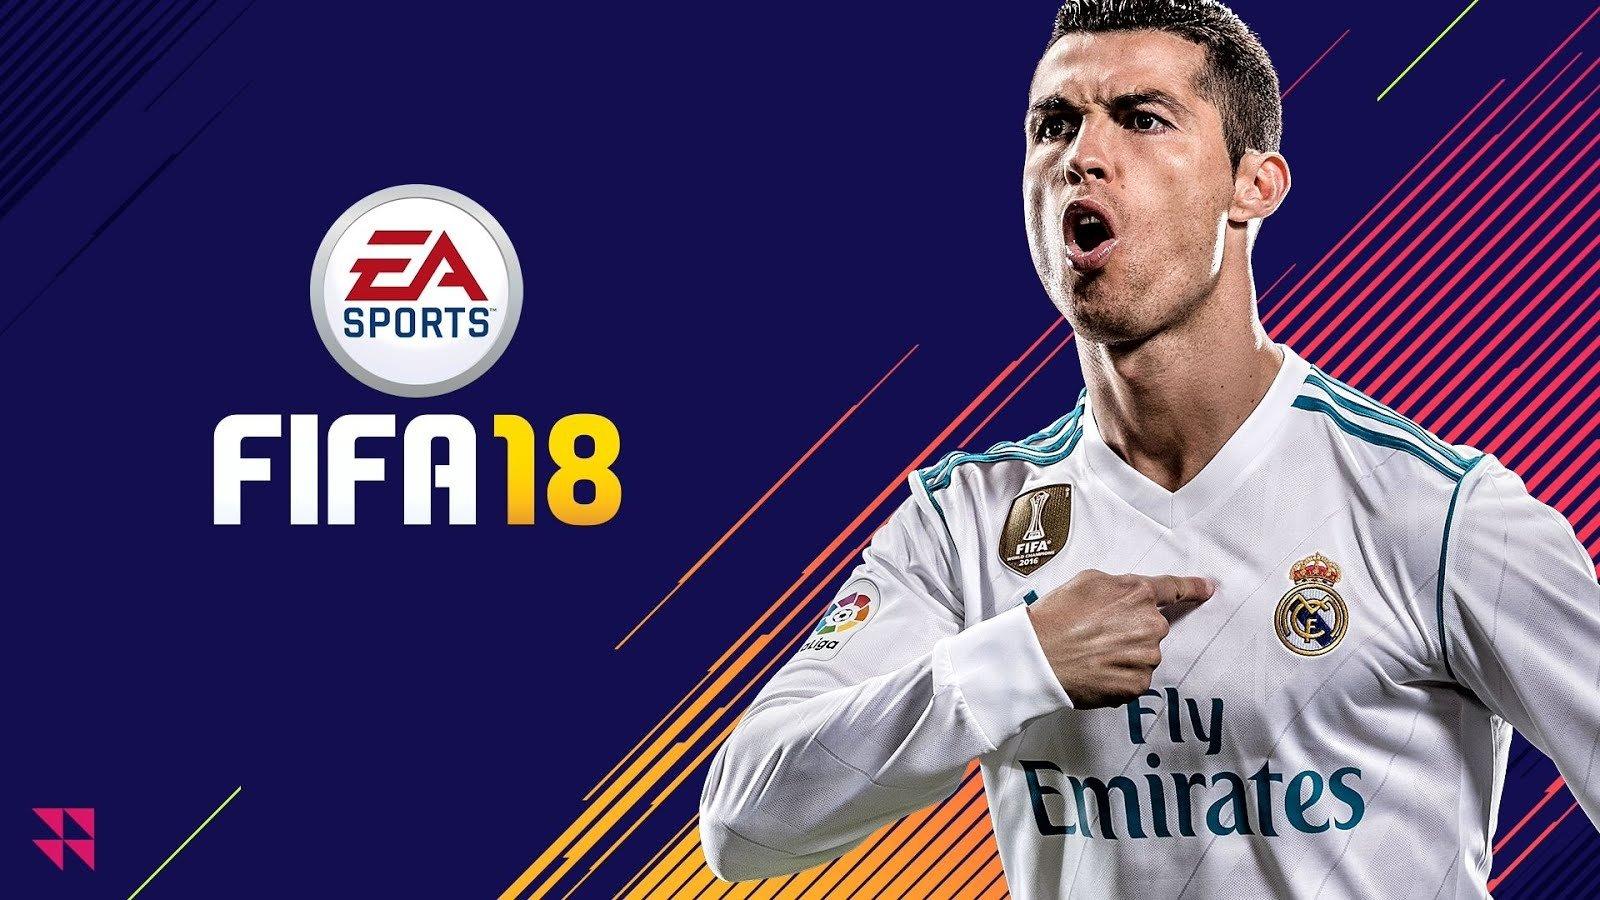 FIFA 18 SÜPER LİG'İN EN İYİ TAKIMLARINI AÇIKLADI